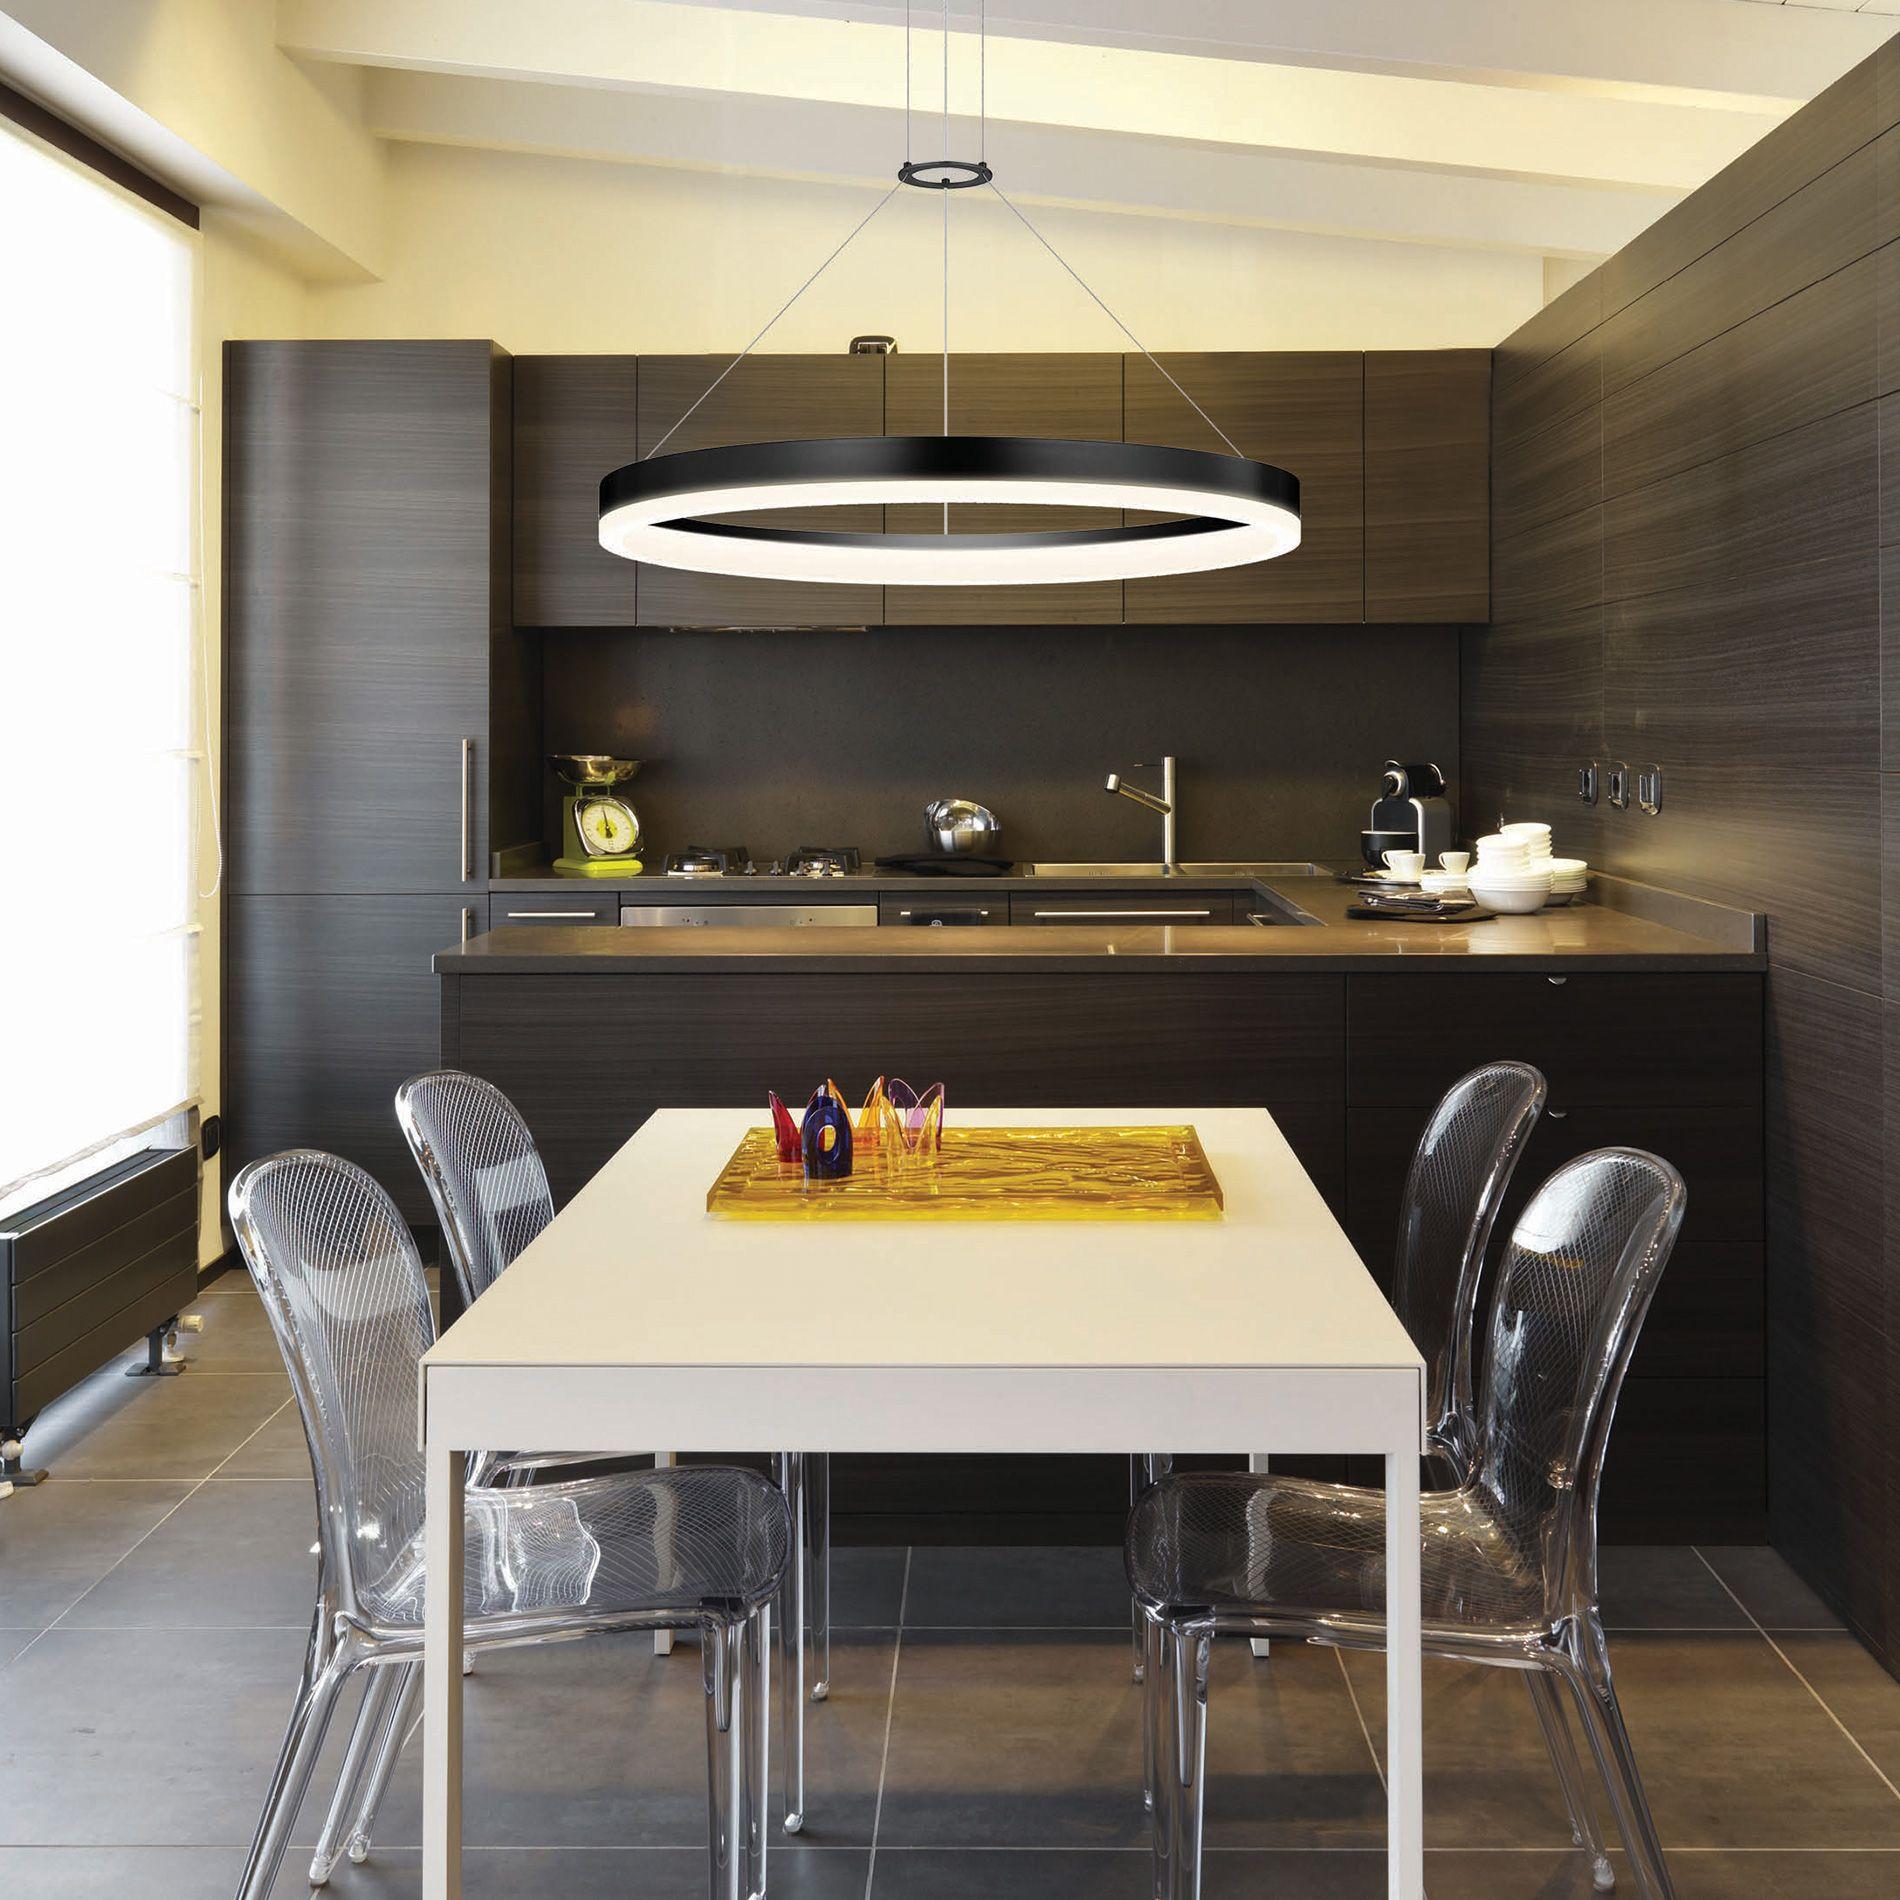 Corona Led Ring Pendantsonneman Lighting  Lighting Love It Classy Hanging Dining Room Lights Design Ideas